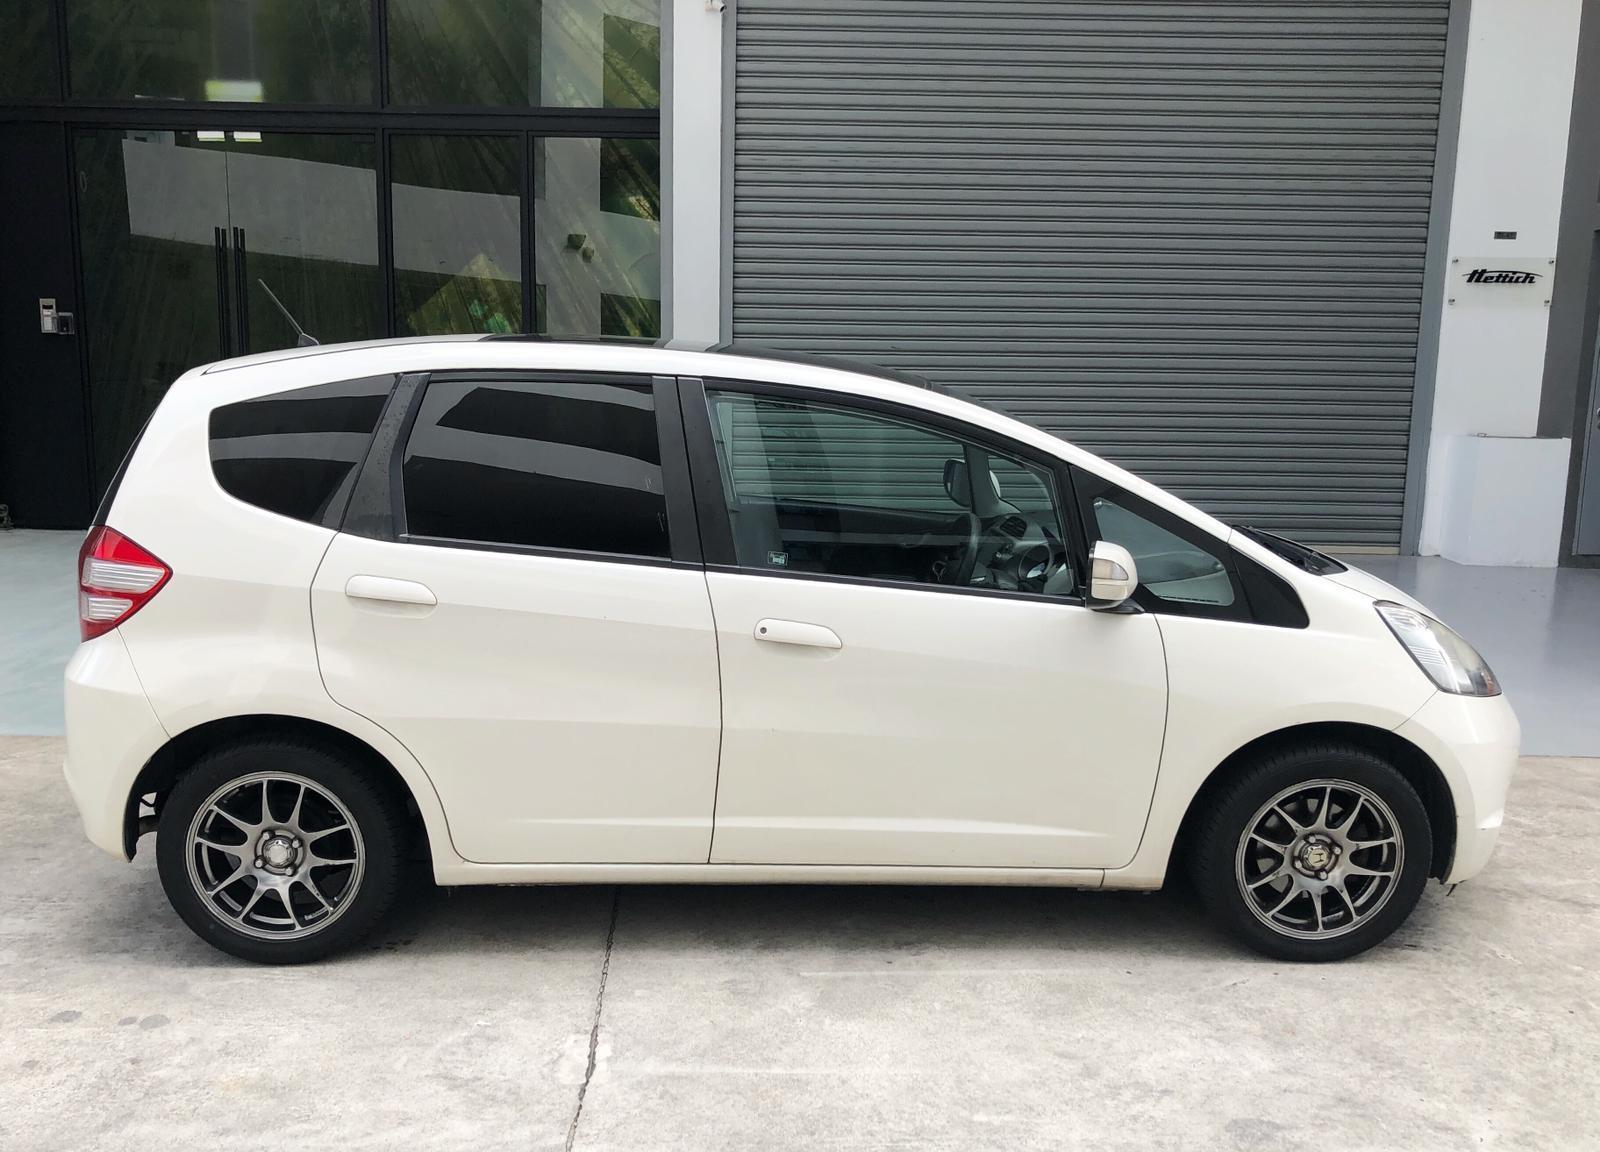 HONDA FIT SKYROOF 1.3a save petrol CHEAP PHV/PERSONAL CAR RENTAL (GOJEK & GRAB READY) chepest rental car